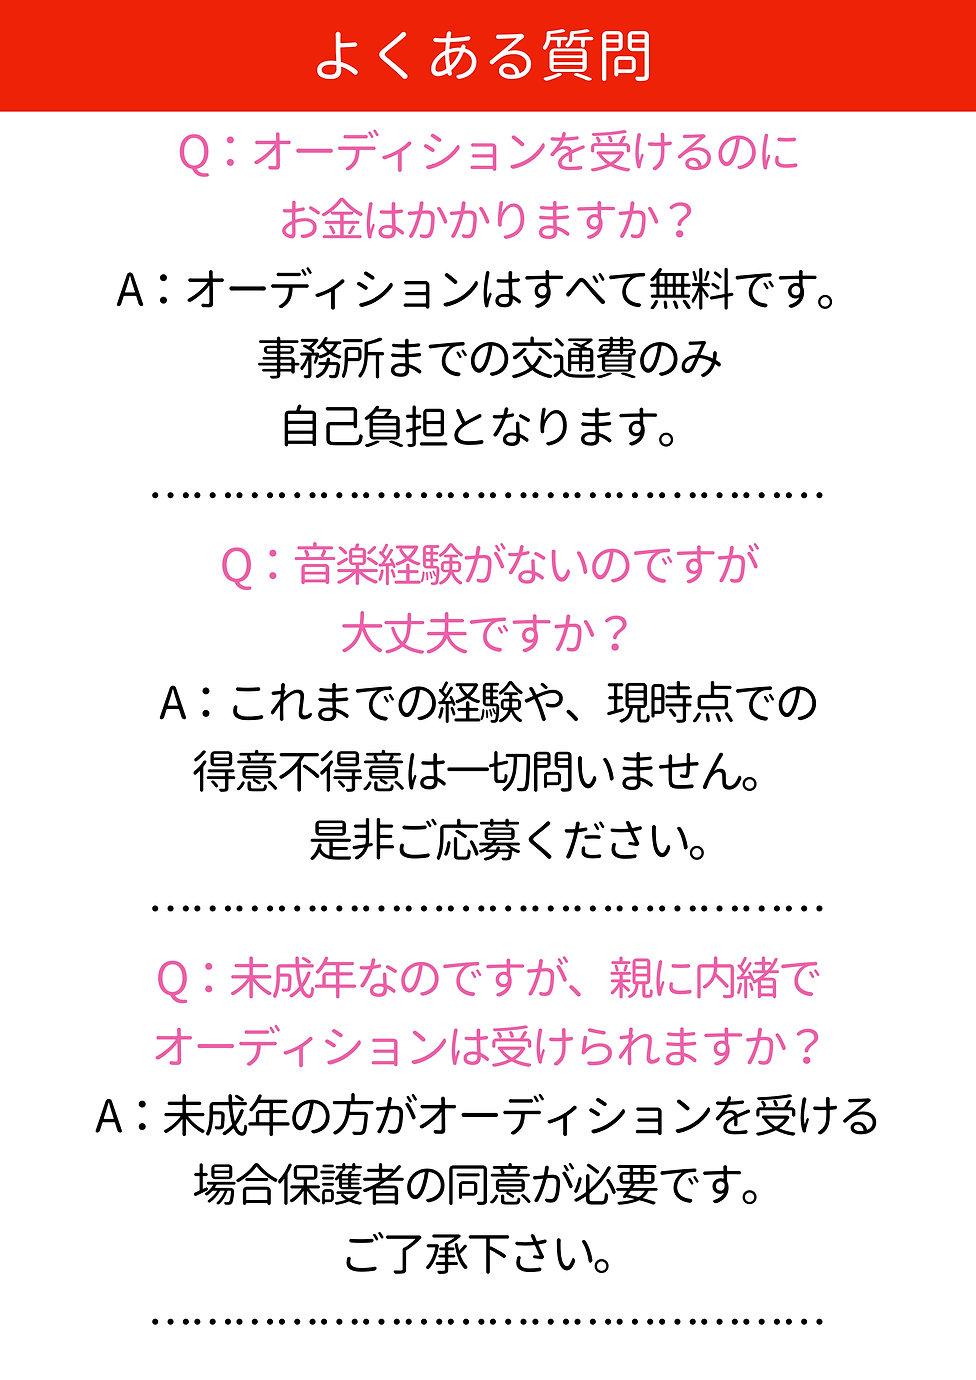 10_OPA_QA1.jpg